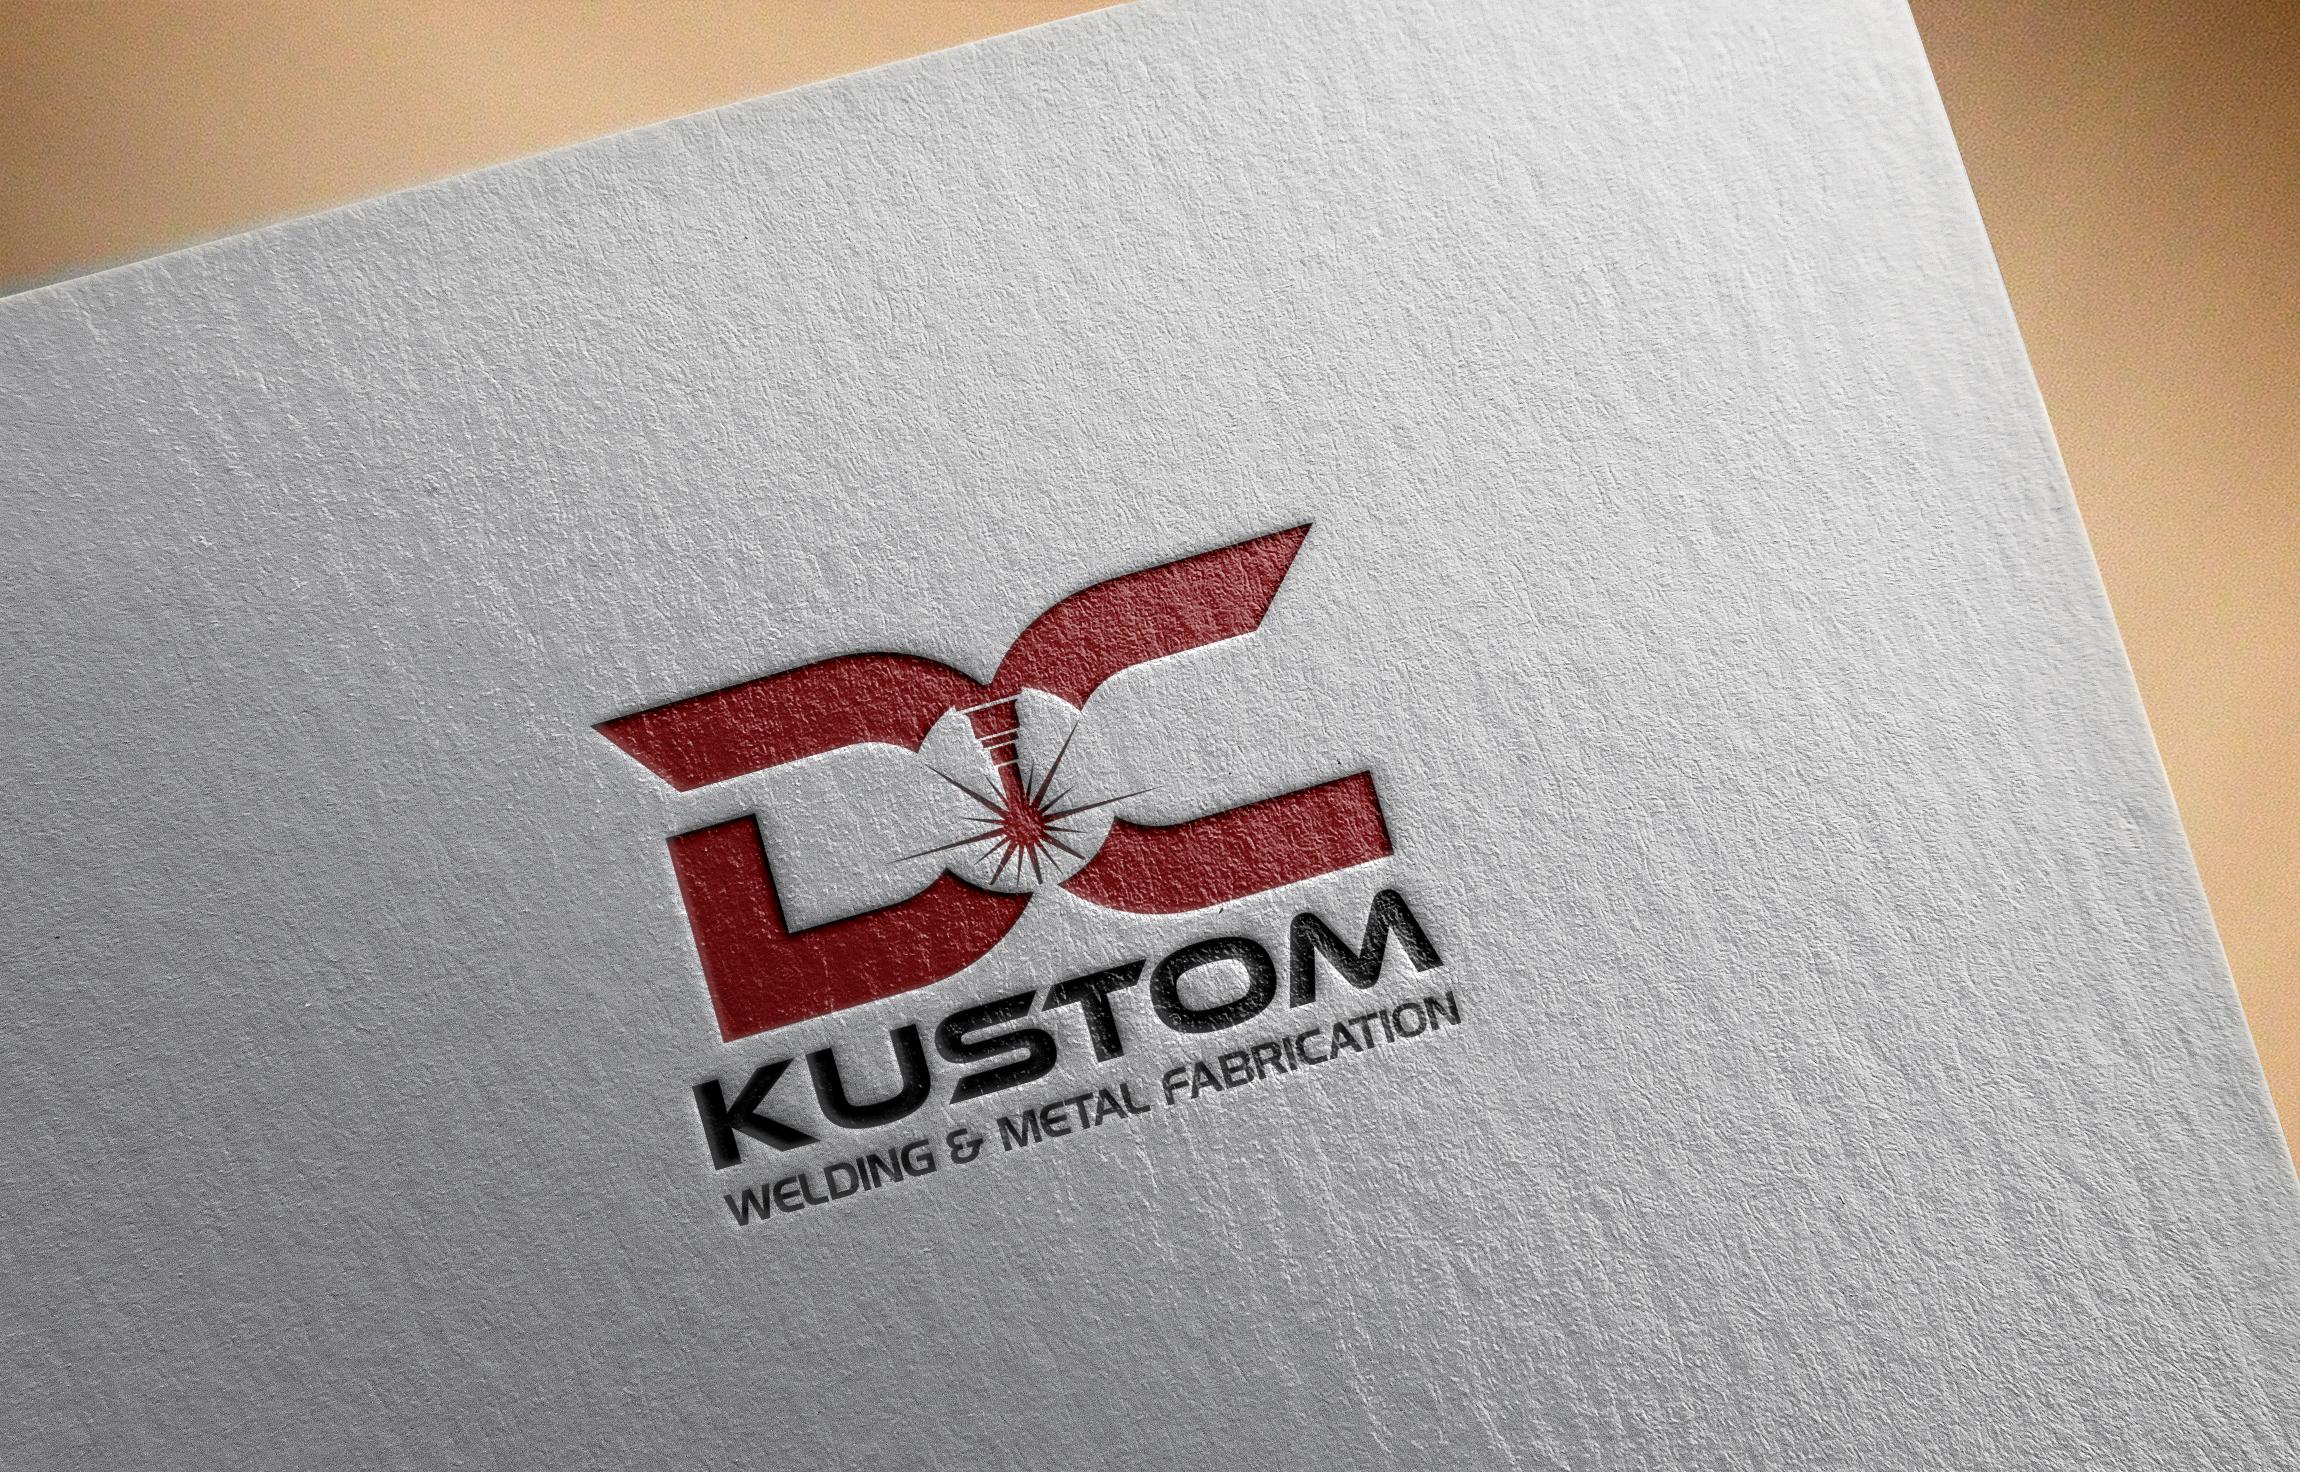 Logo Design by Raymond Garcia - Entry No. 47 in the Logo Design Contest Imaginative Logo Design for DC KUSTOM WELDING & METAL FABRICATION.